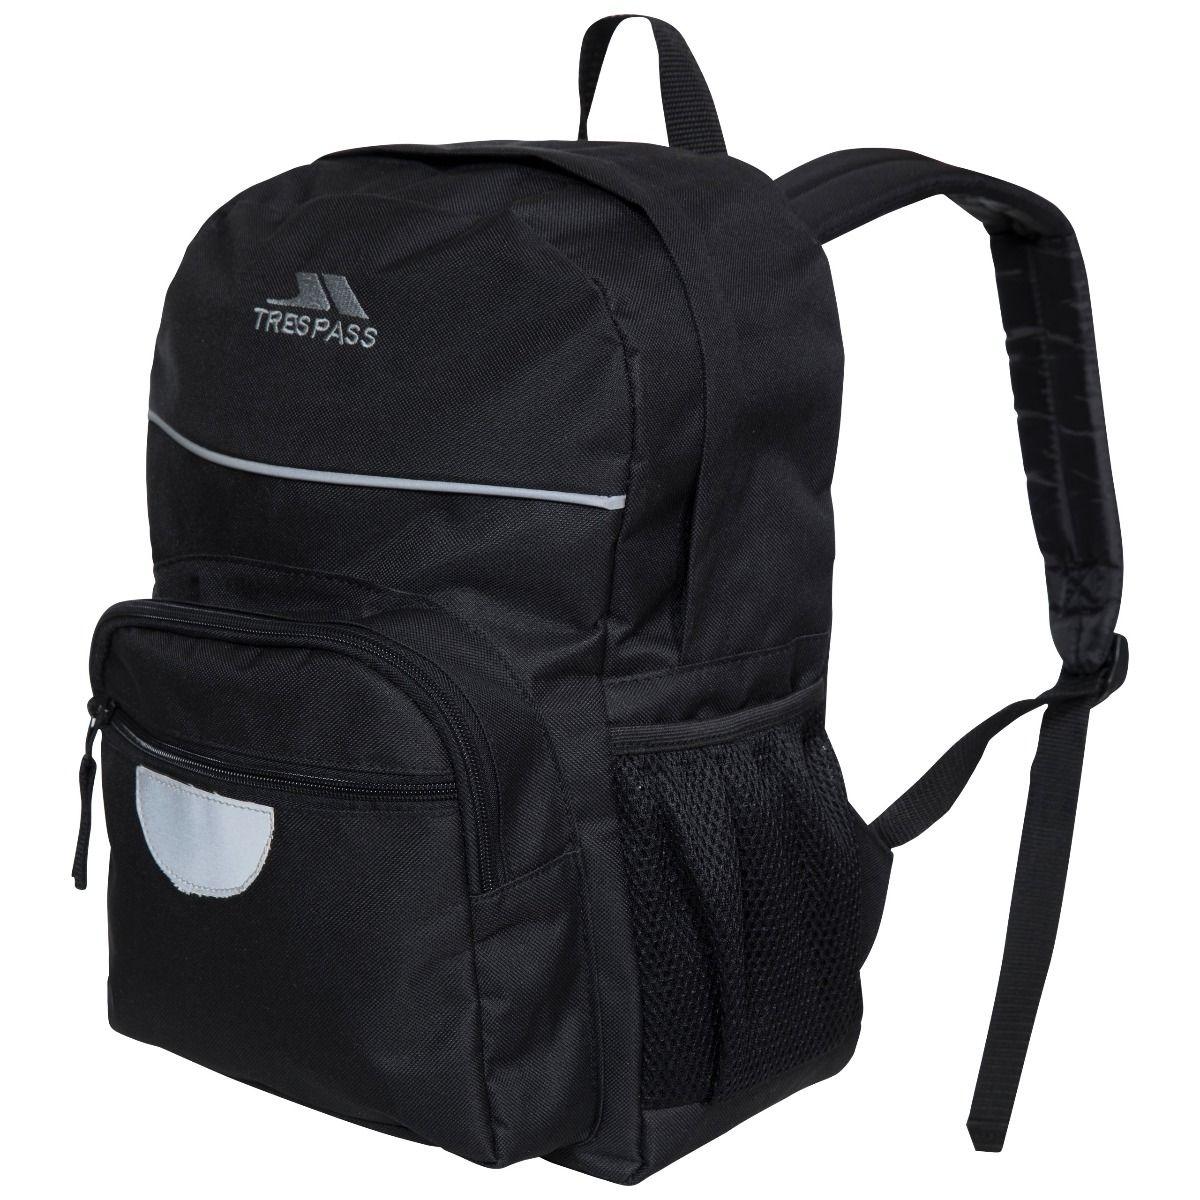 Trespass Childrens/Kids Swagger School Backpack/Rucksack ...